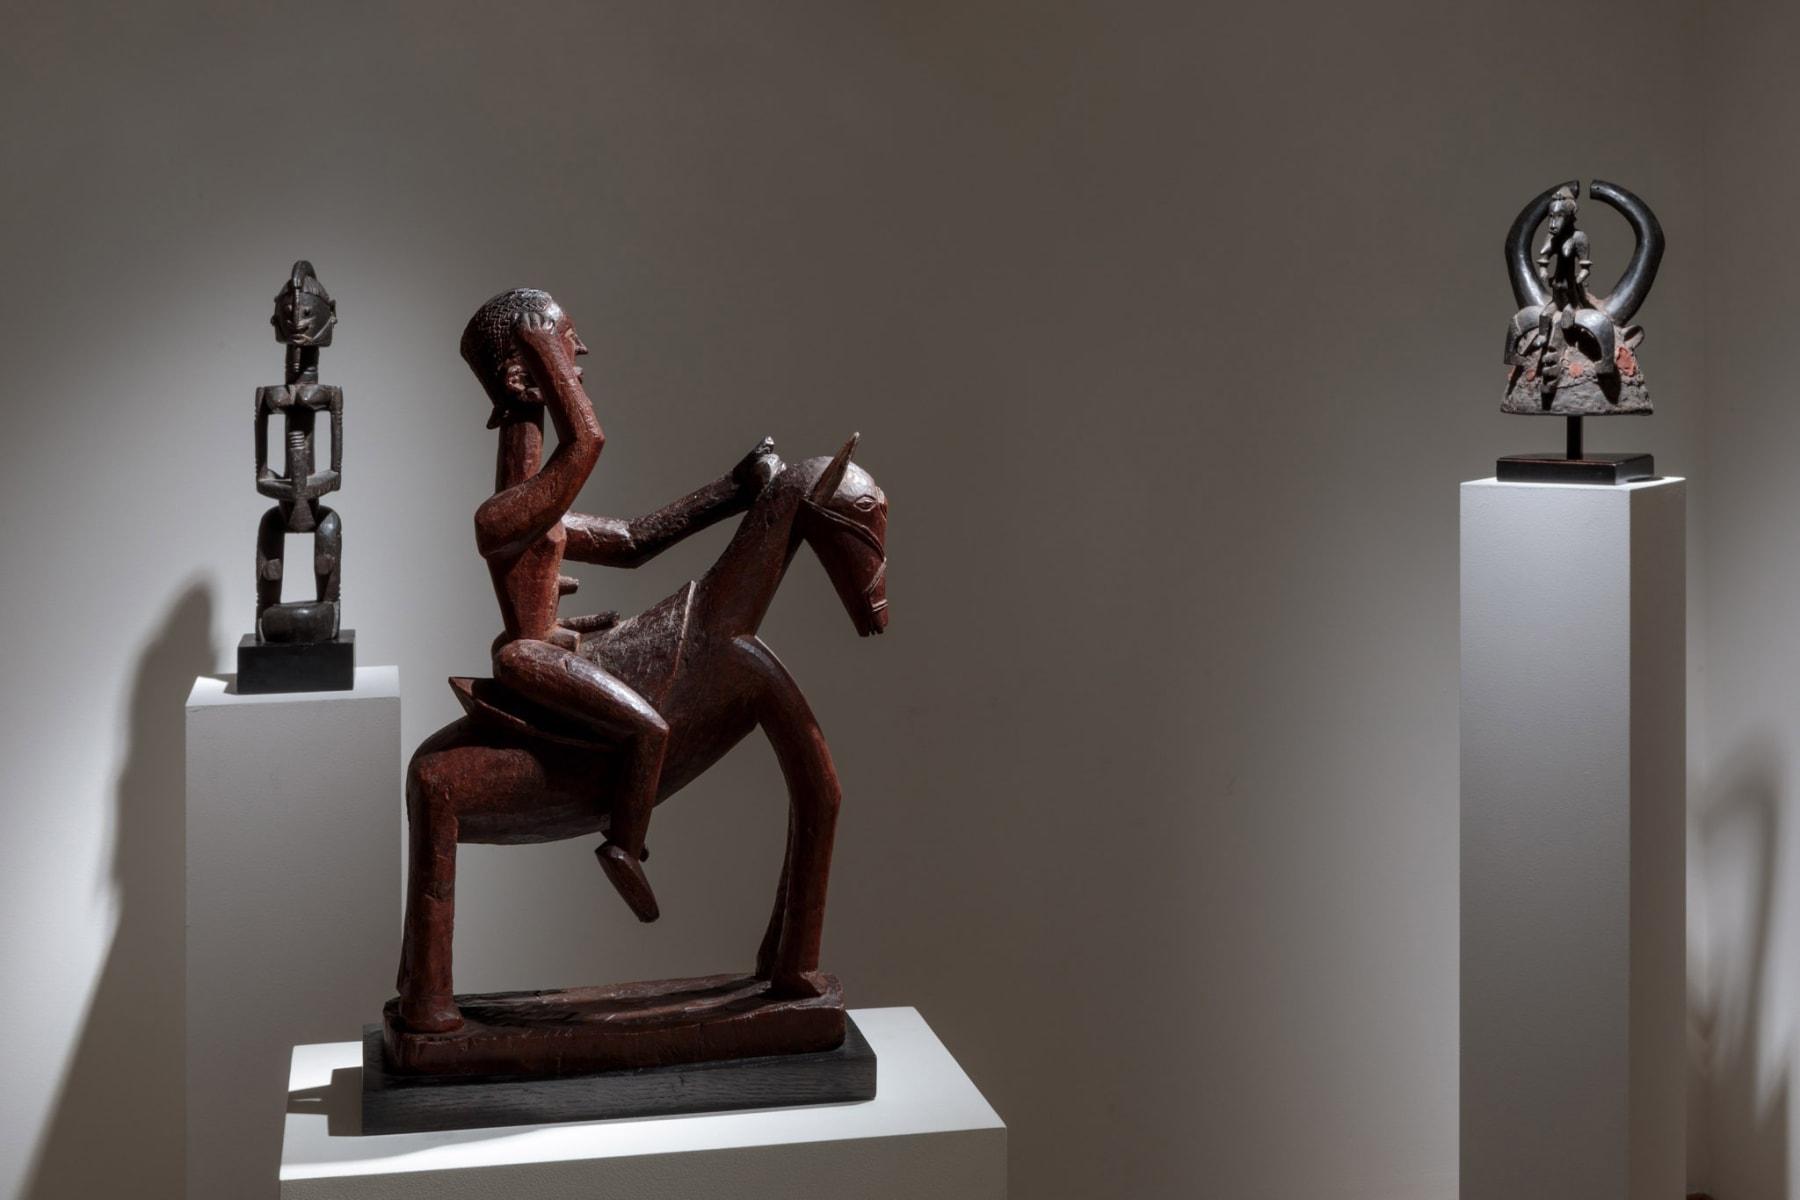 Dogon Figure; Dogon Horse and Rider, both from Mali; Senufo Helmet, Ivory Coast